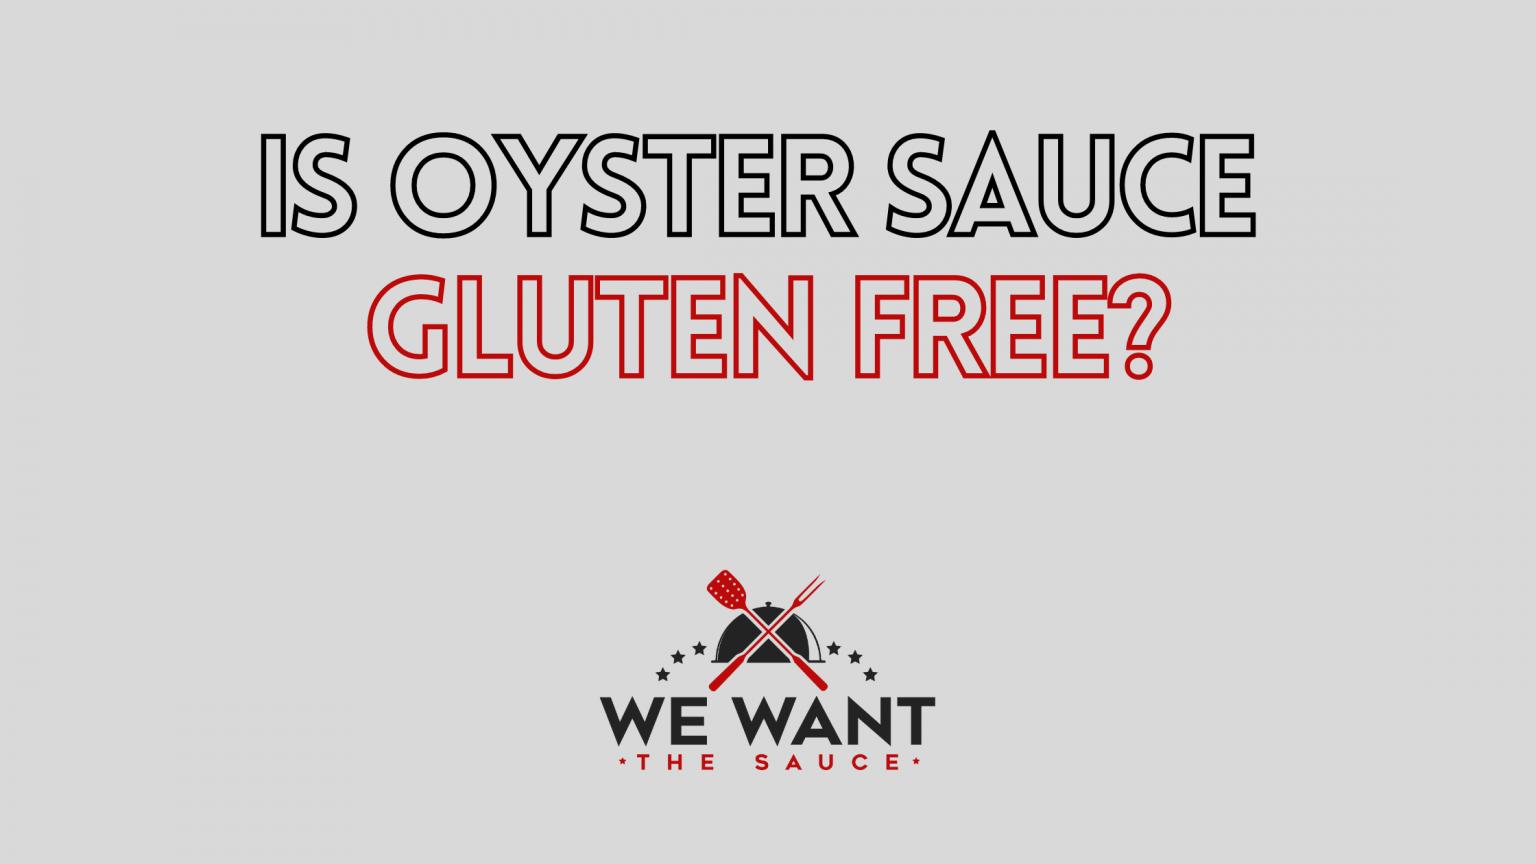 Is Oyster Sauce Gluten Free